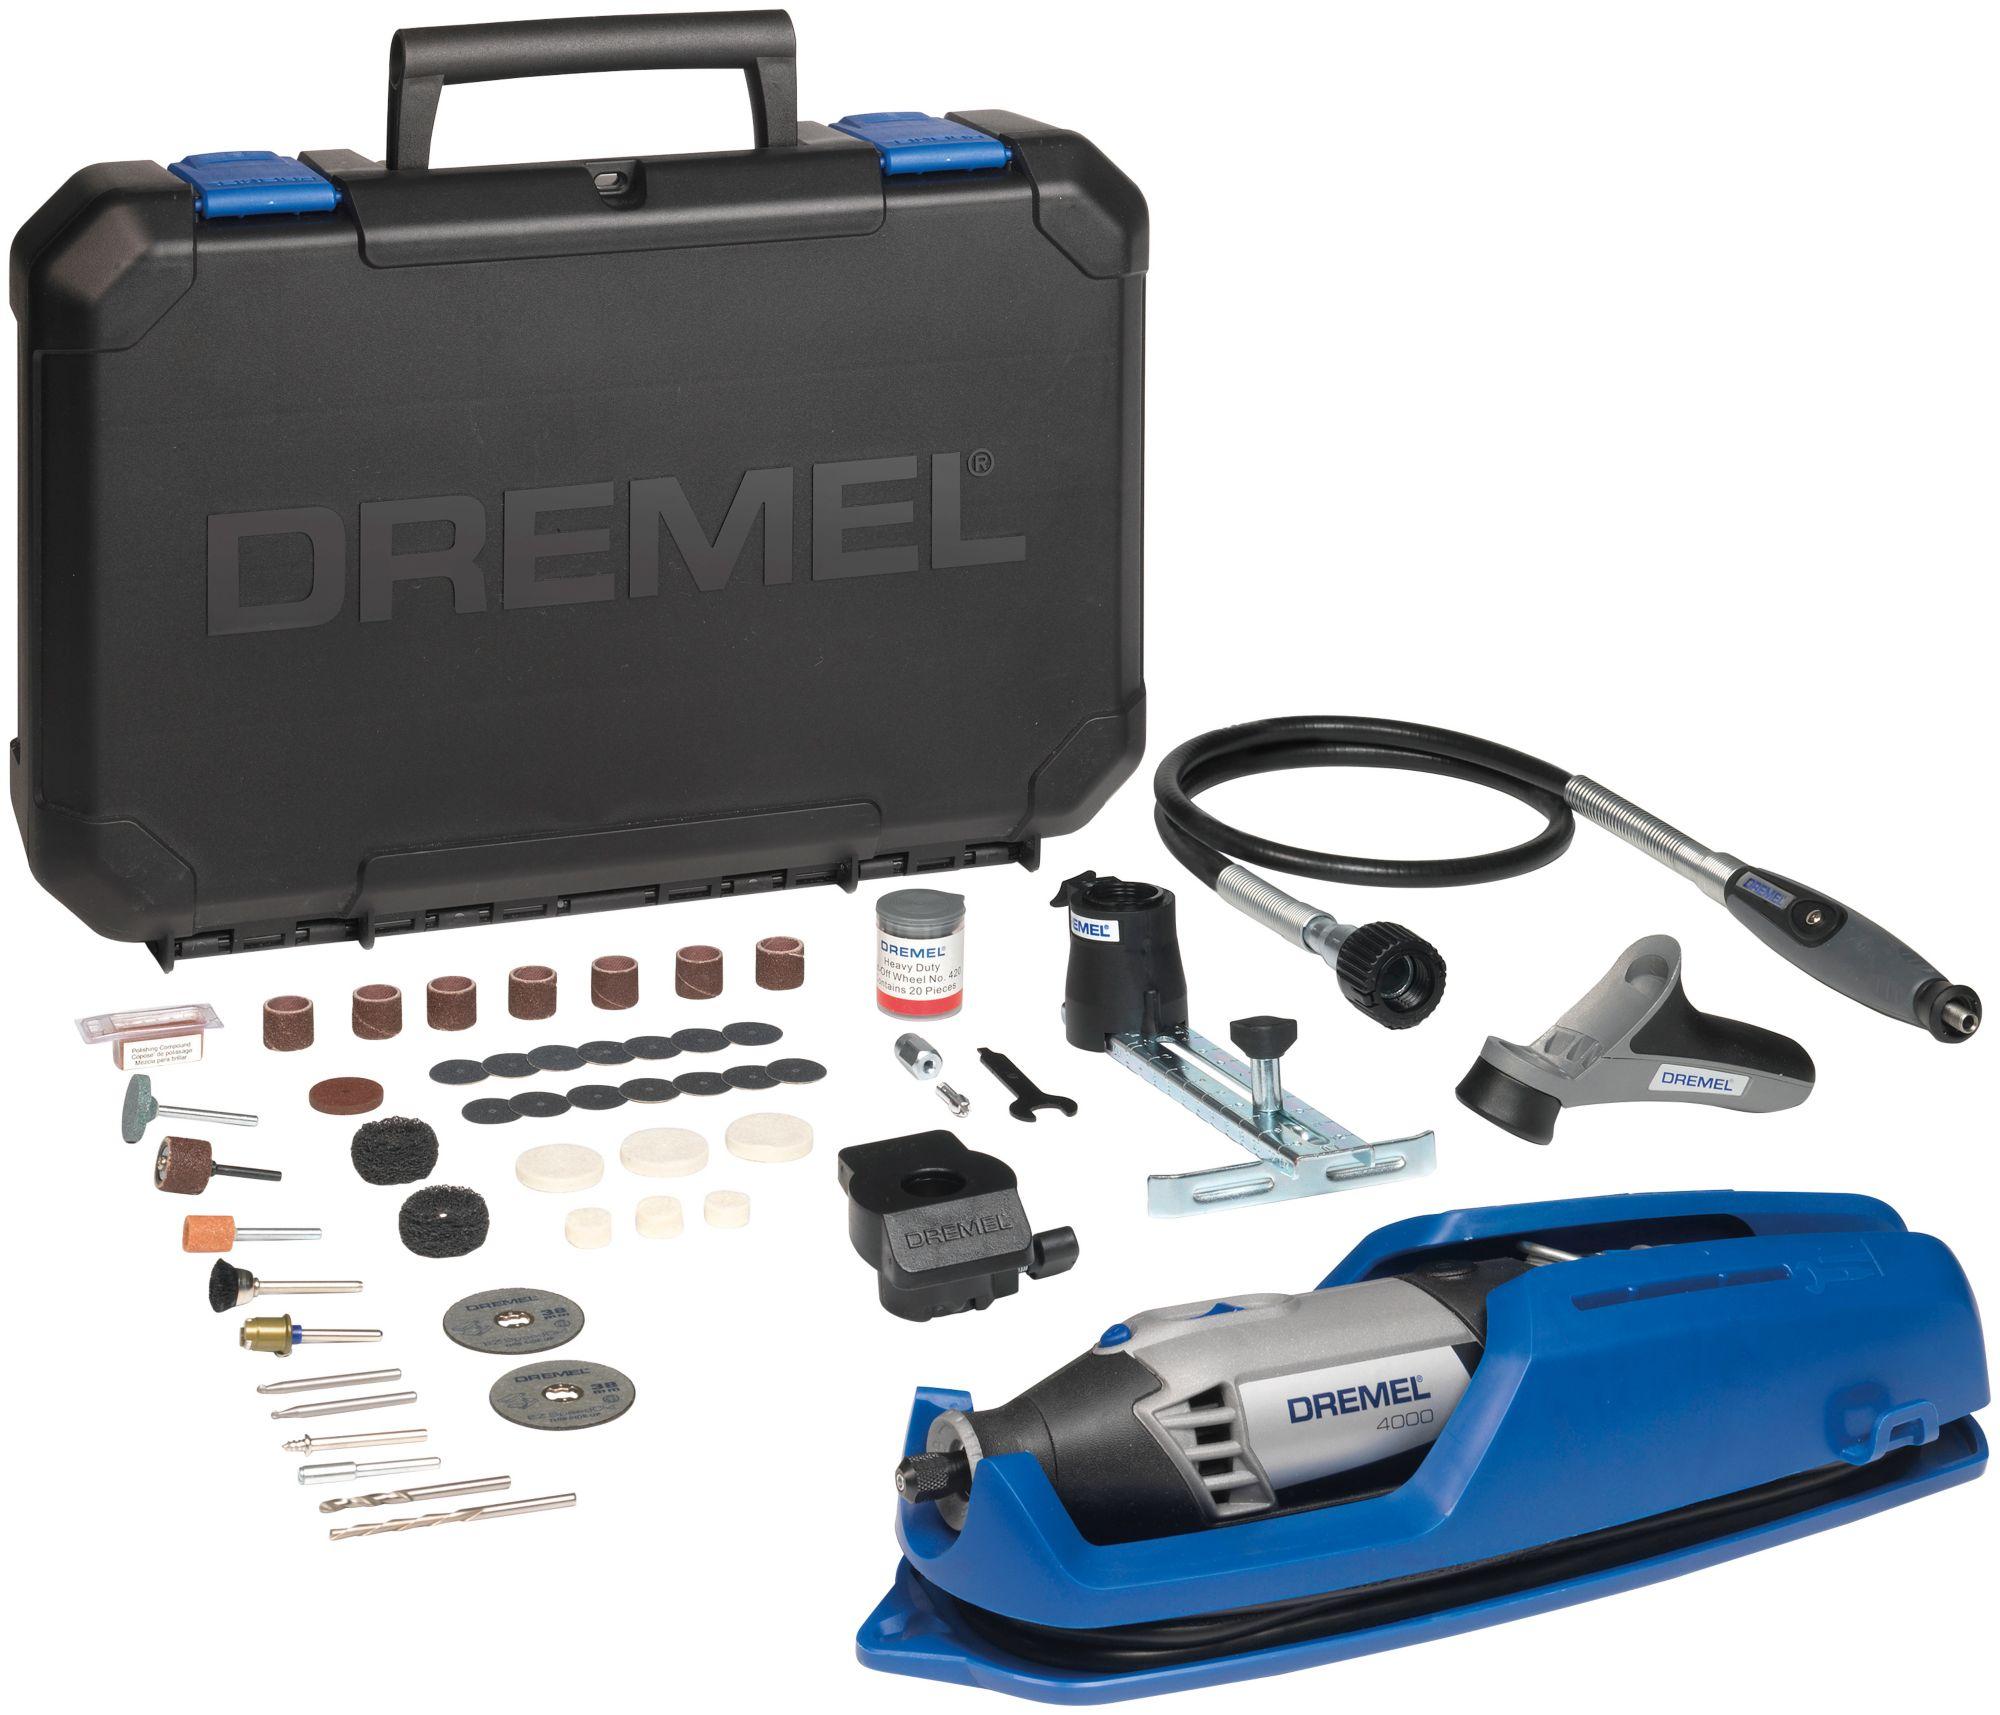 DREMEL Dremel 4000-4/65 Multifunktionswerkzeug